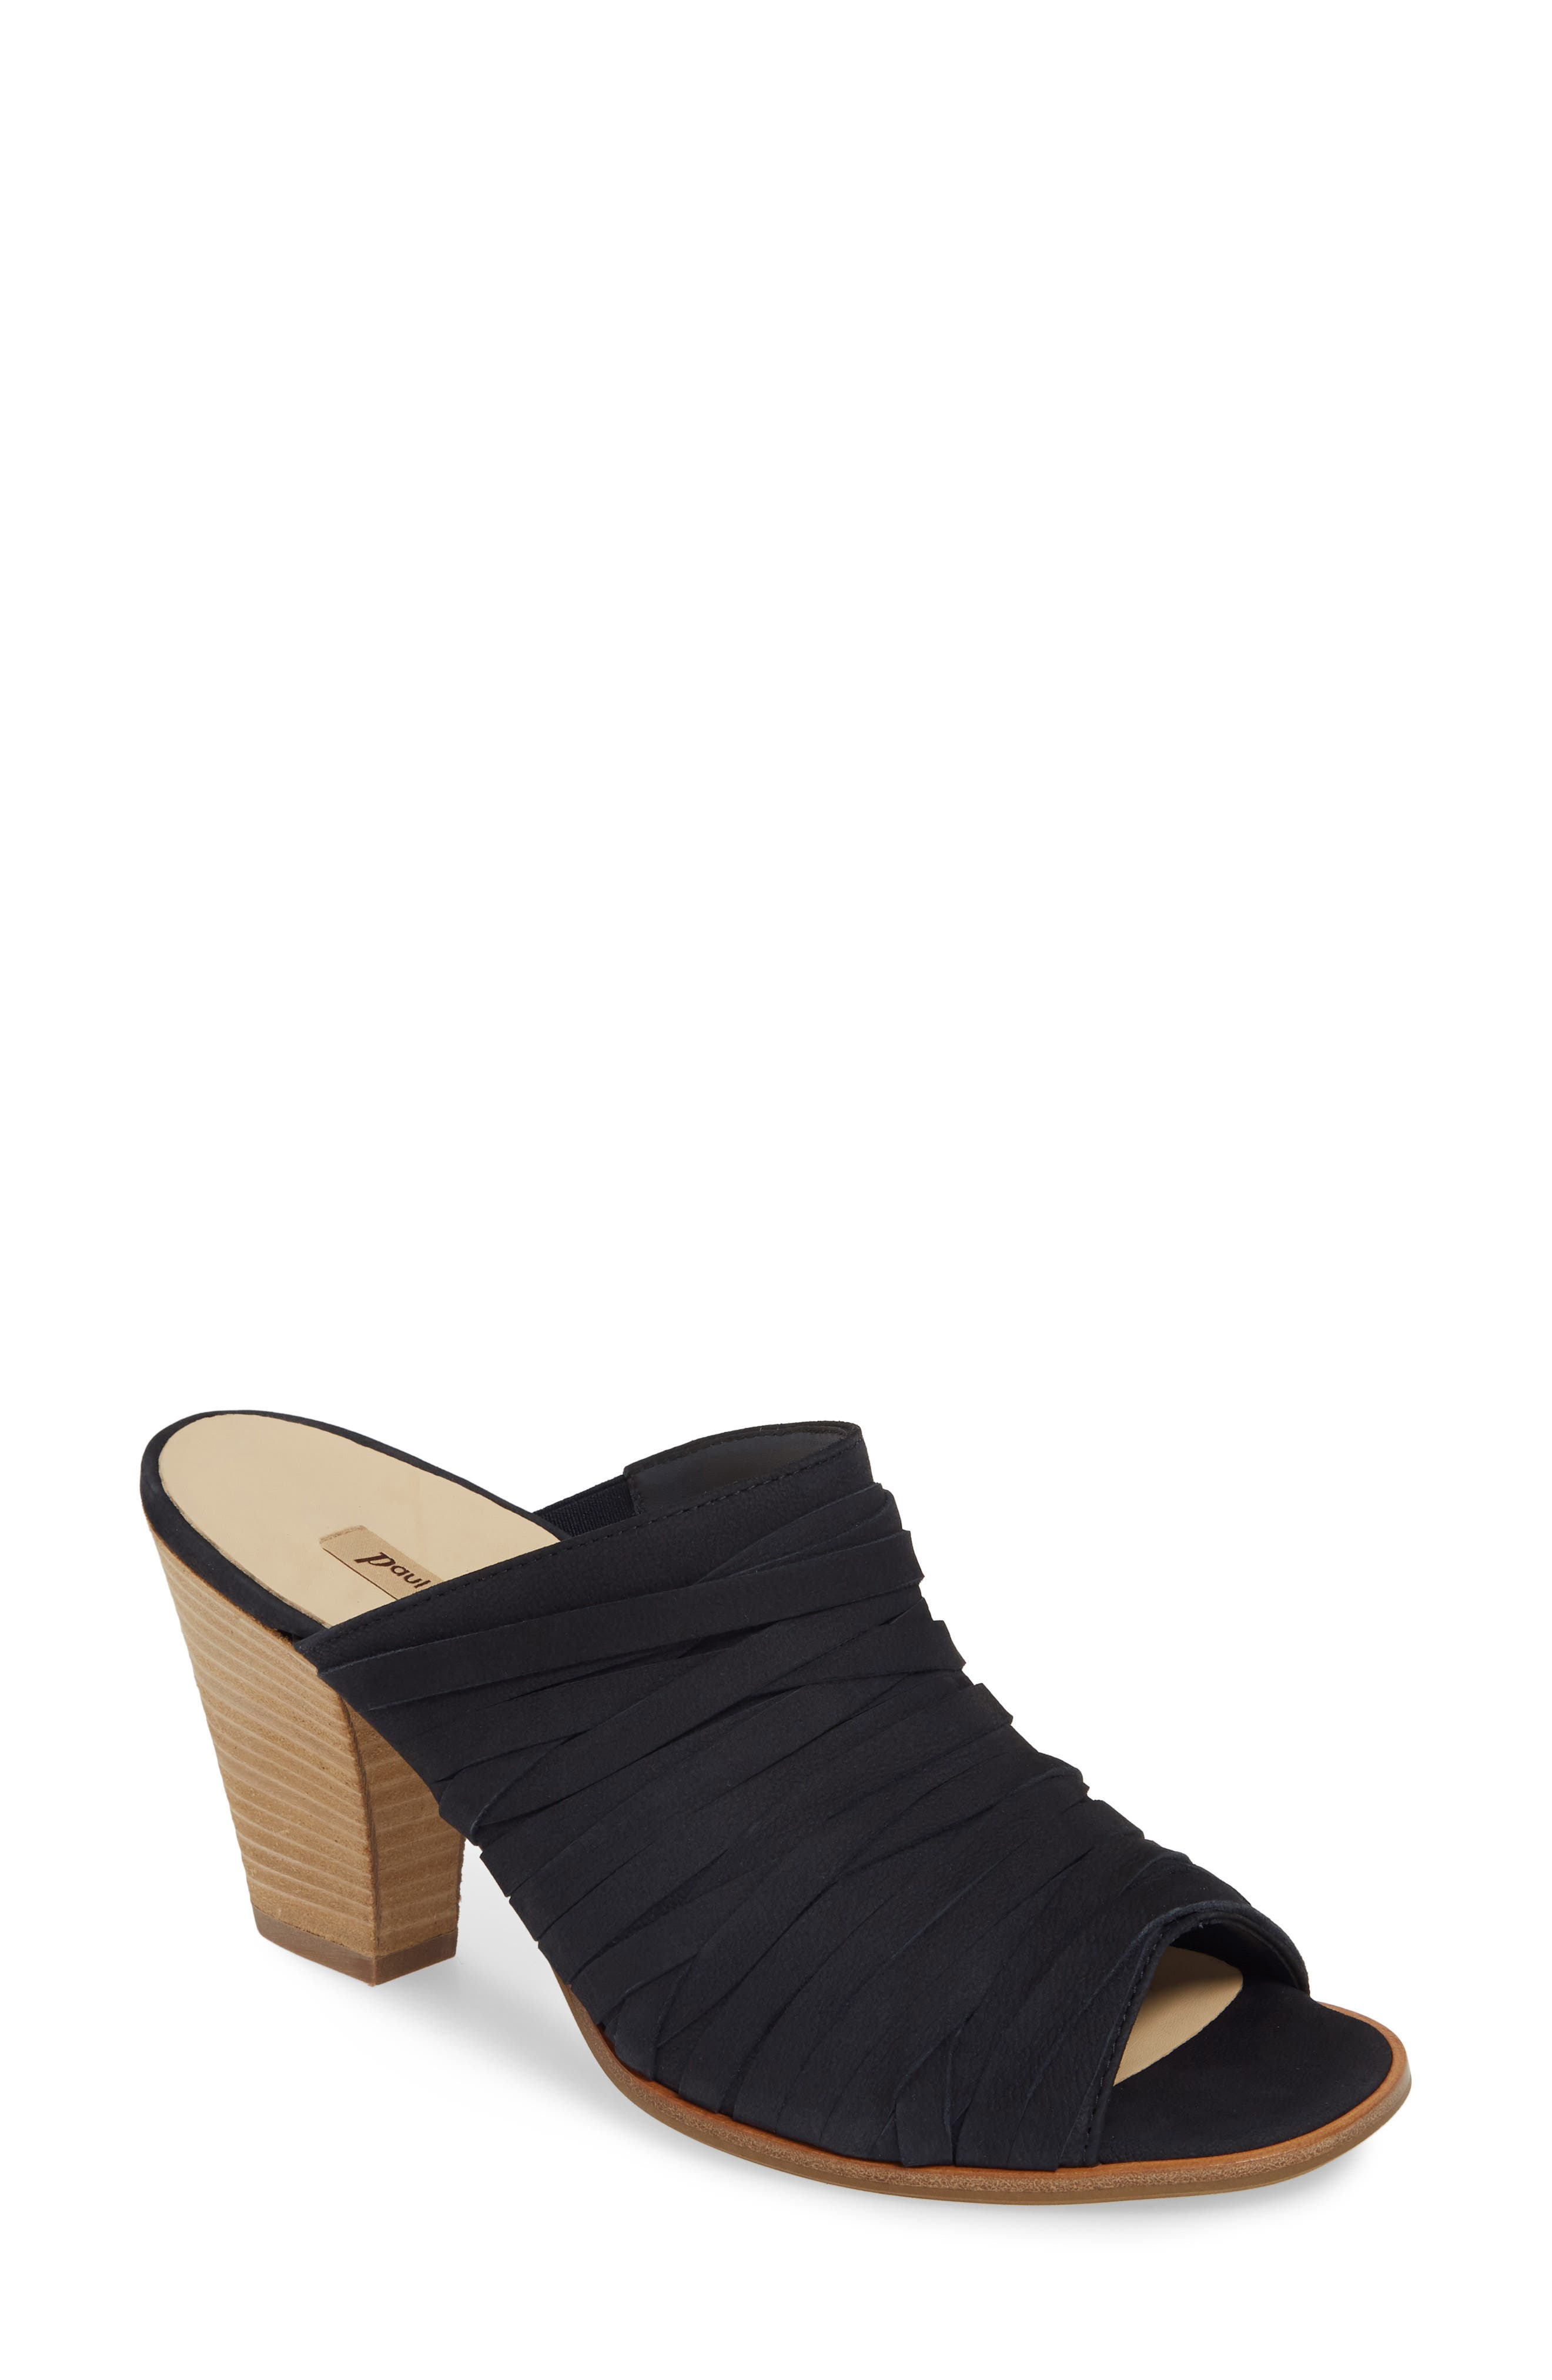 Avery Strappy Mule Sandal, Main, color, BLUE SOFT NUBUCK